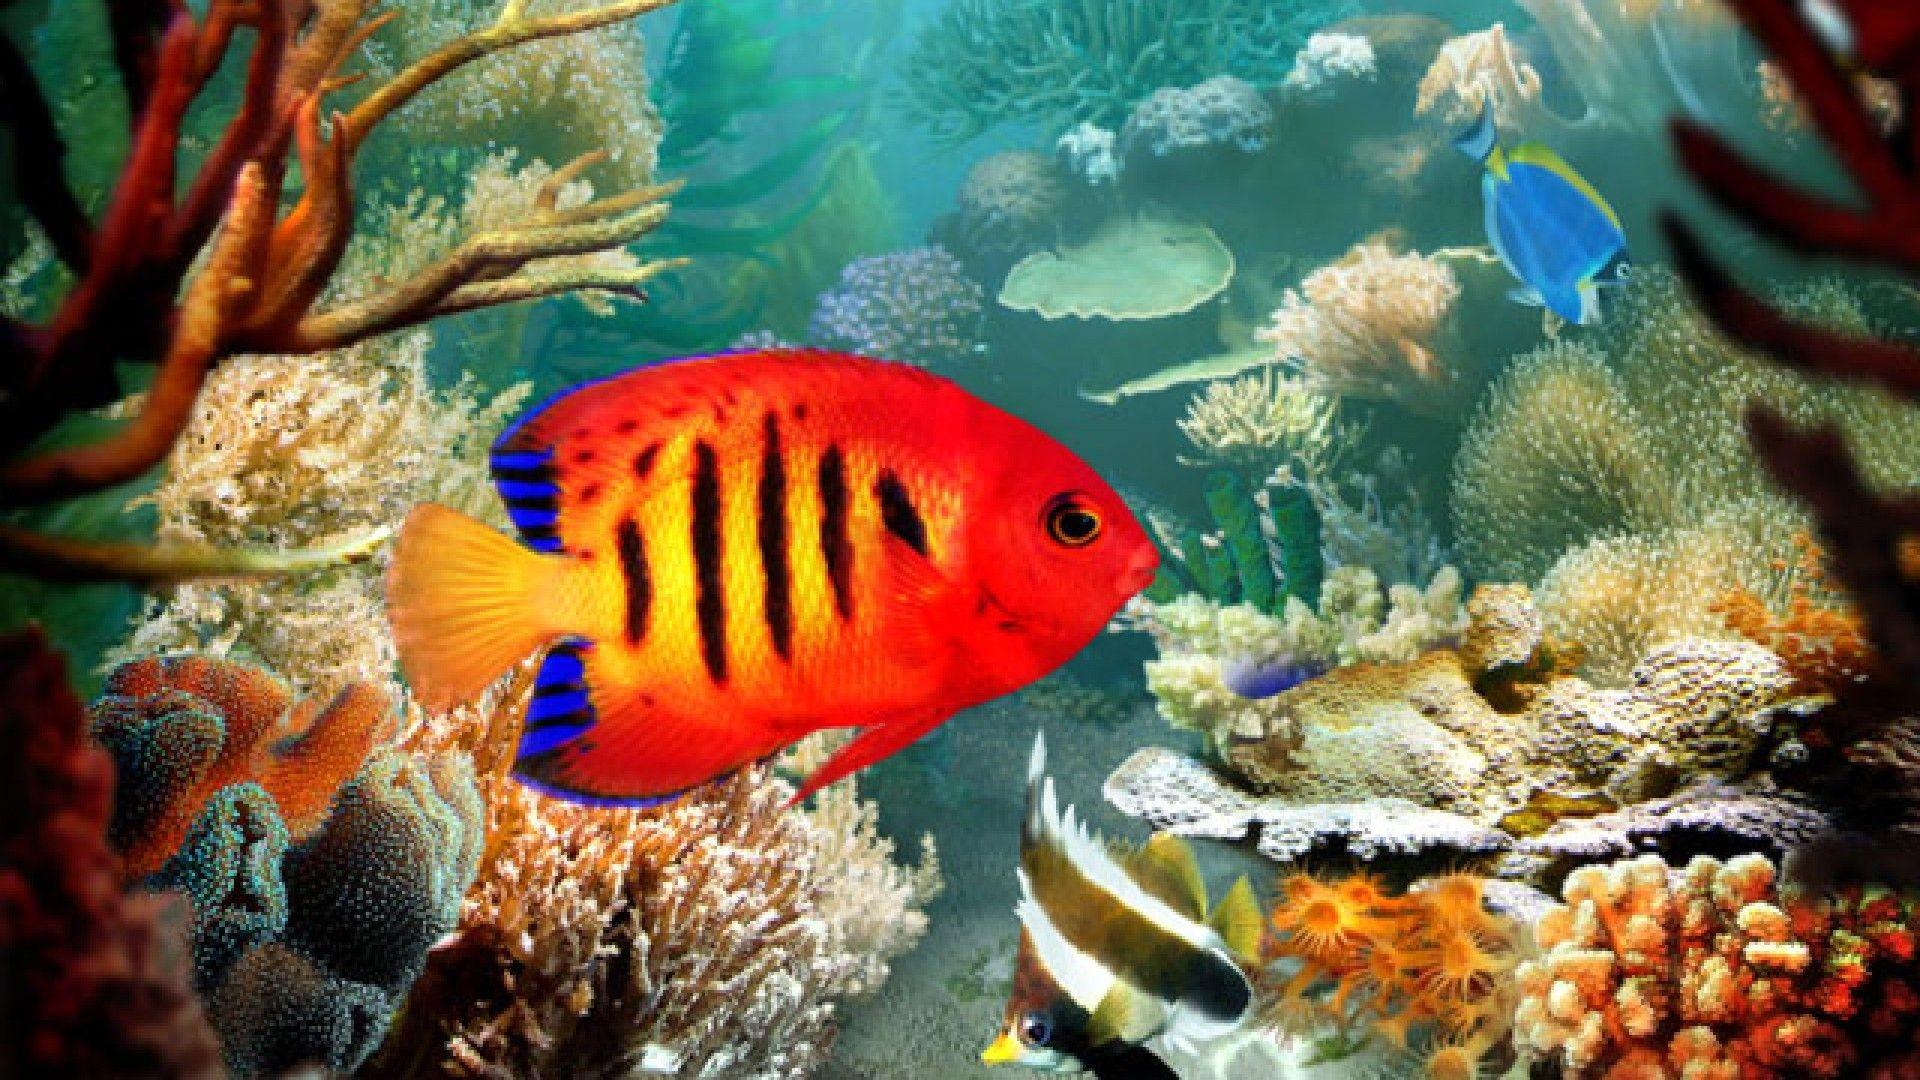 Res: 1920x1080, Homepage » Fish » Tropical Fish 3D wallpaper